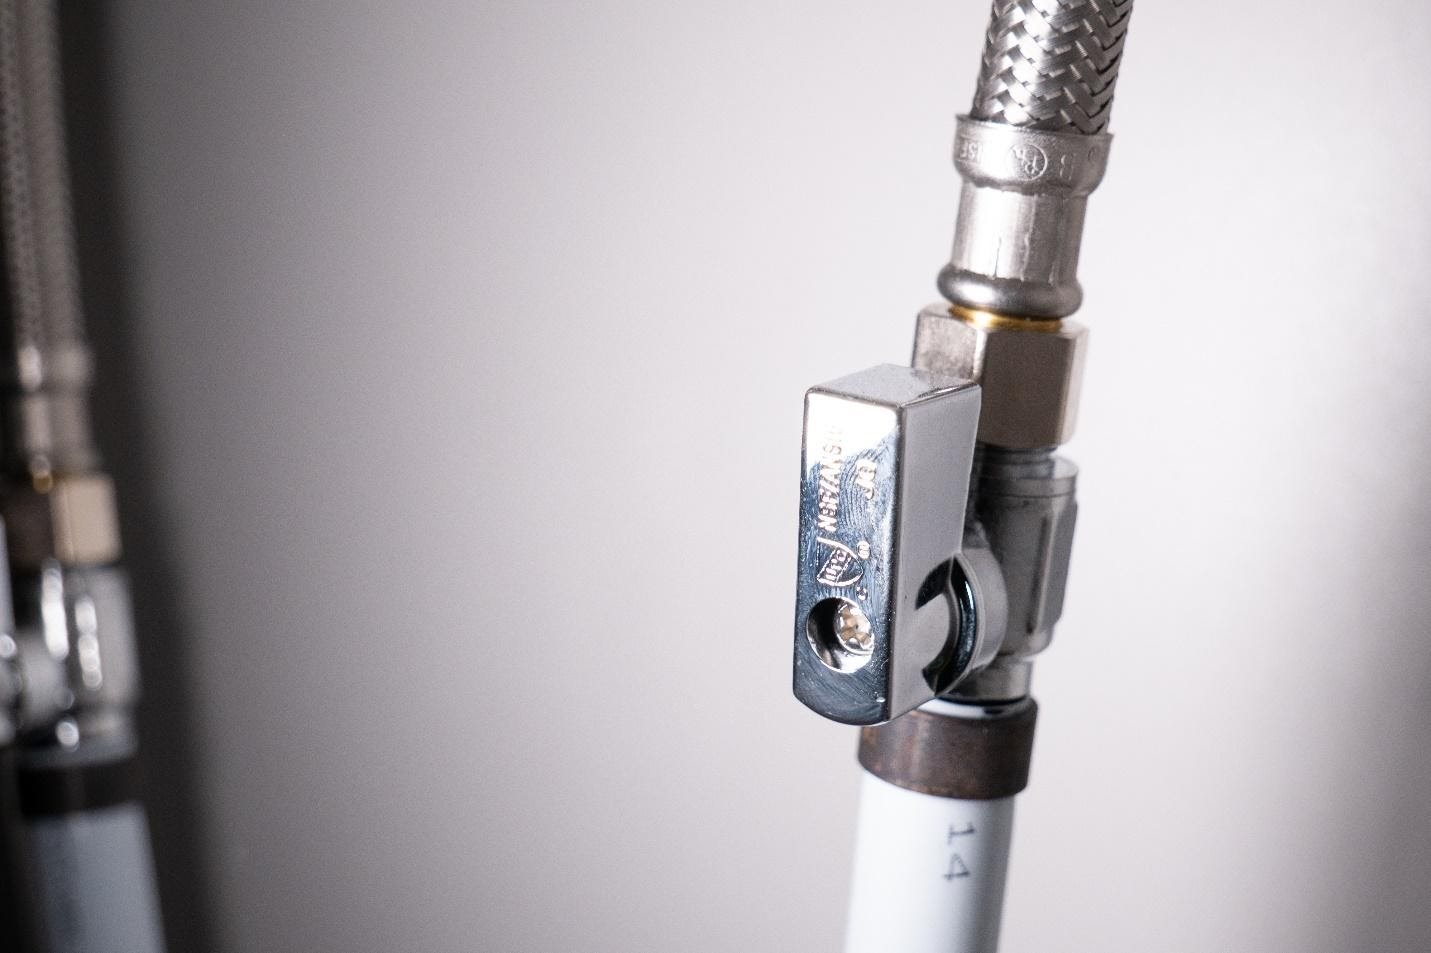 Waterline Hookup For Appliances